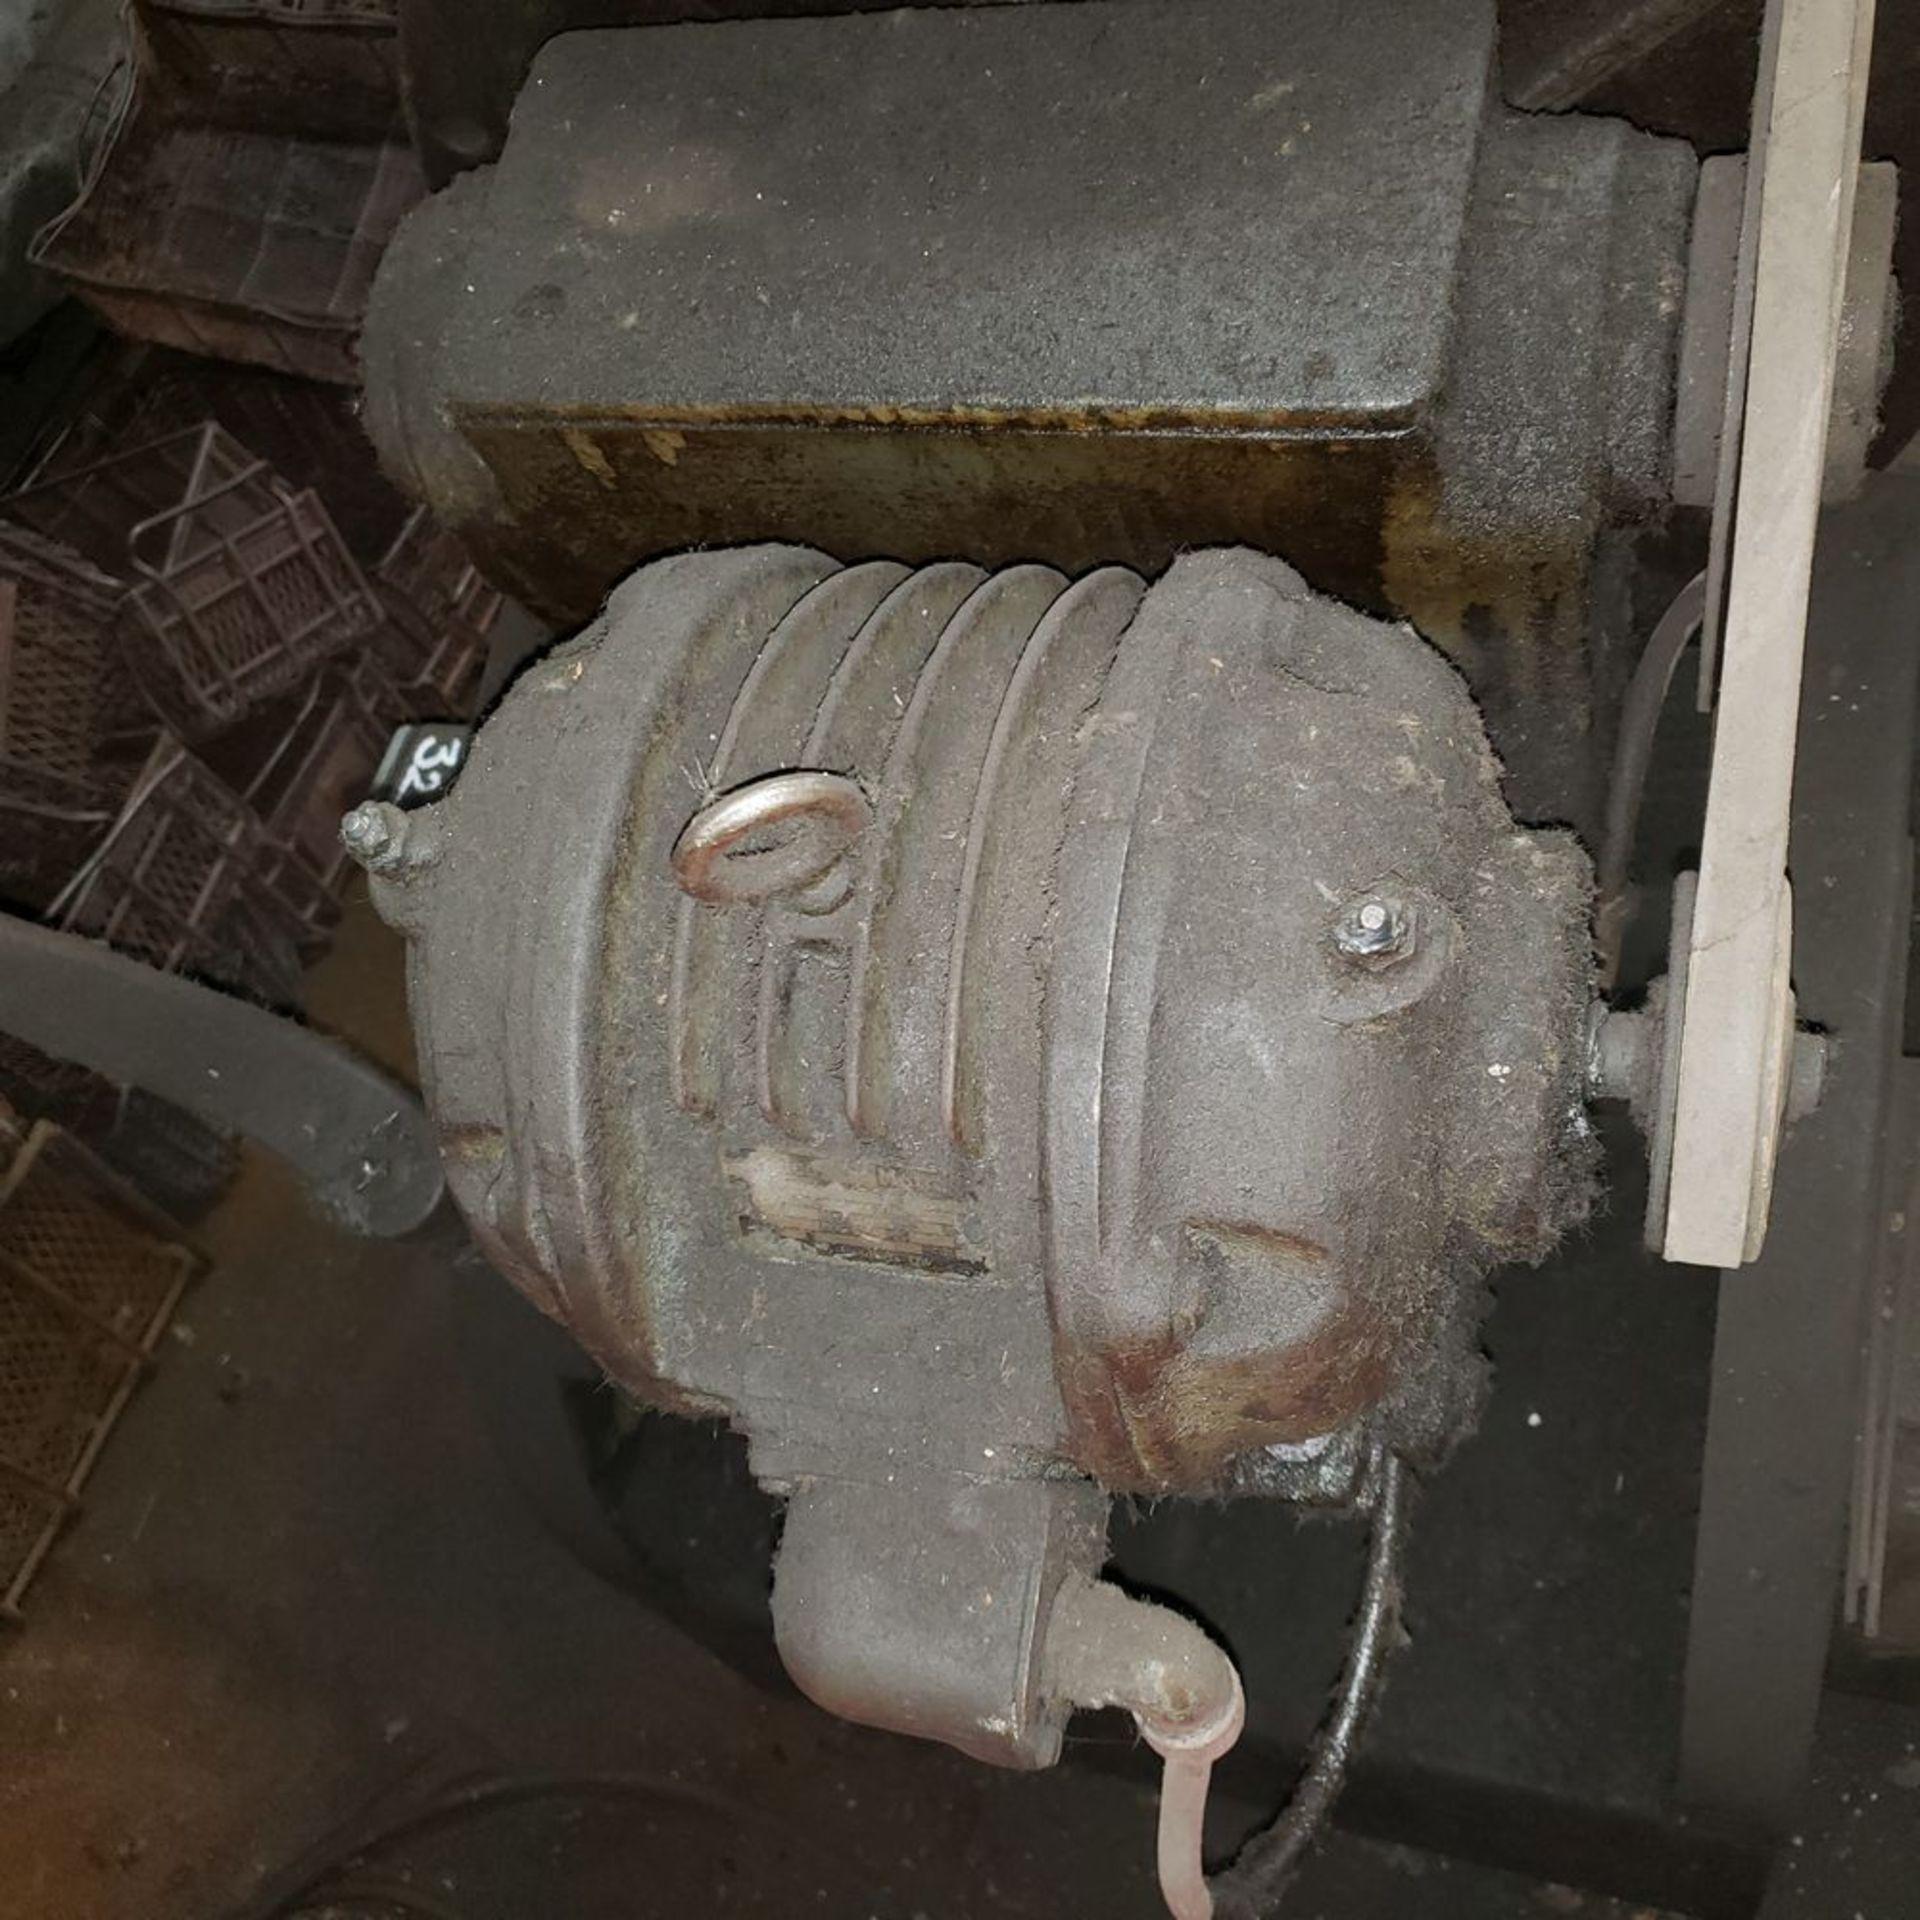 Baird Crank Tumbler - Image 3 of 4